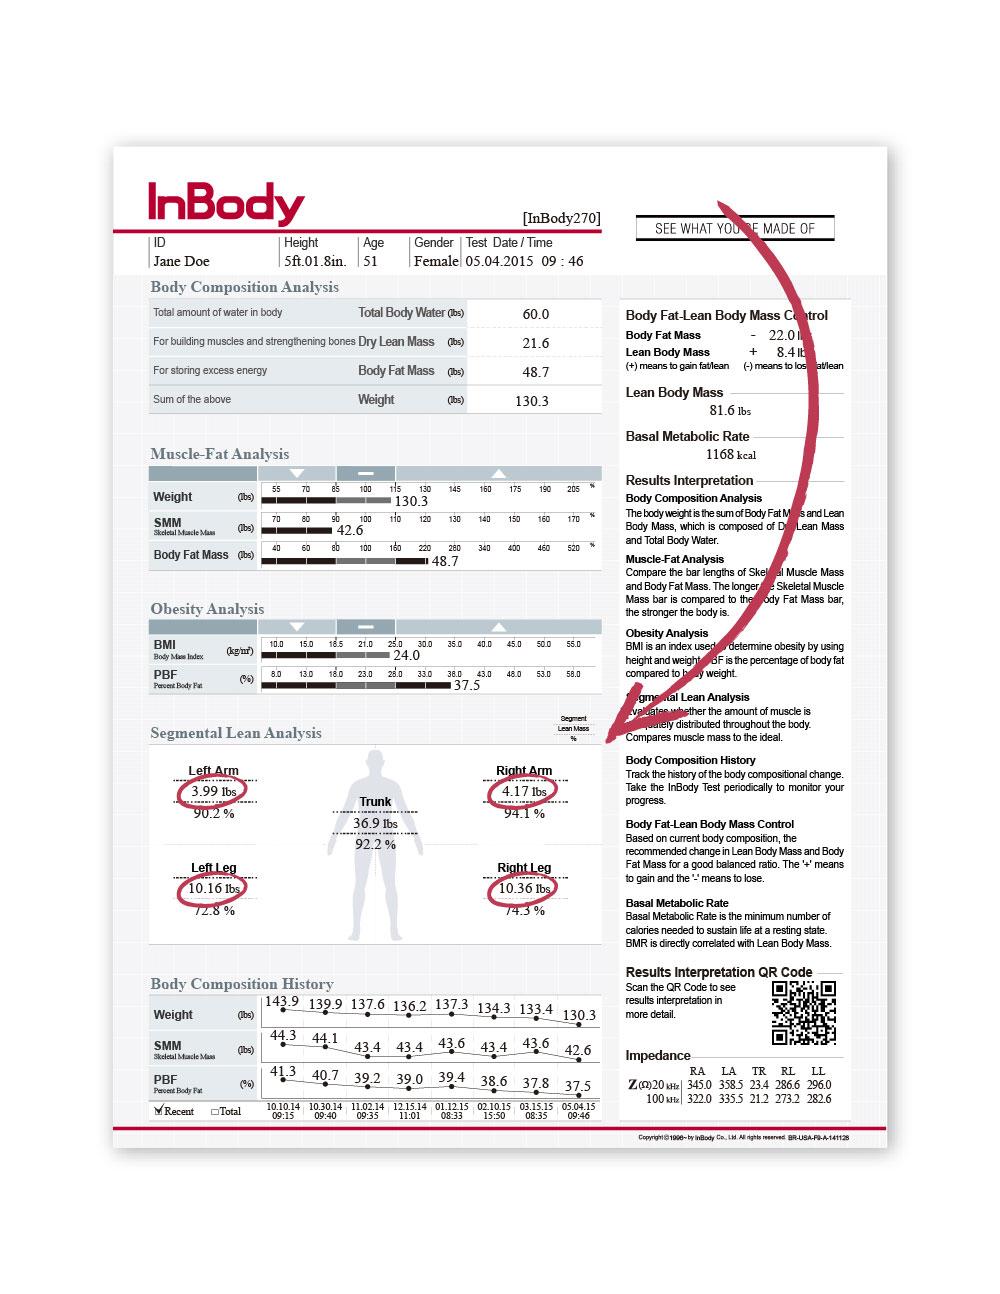 The InBody 270 result sheet changes in segmental lean analysis poundage